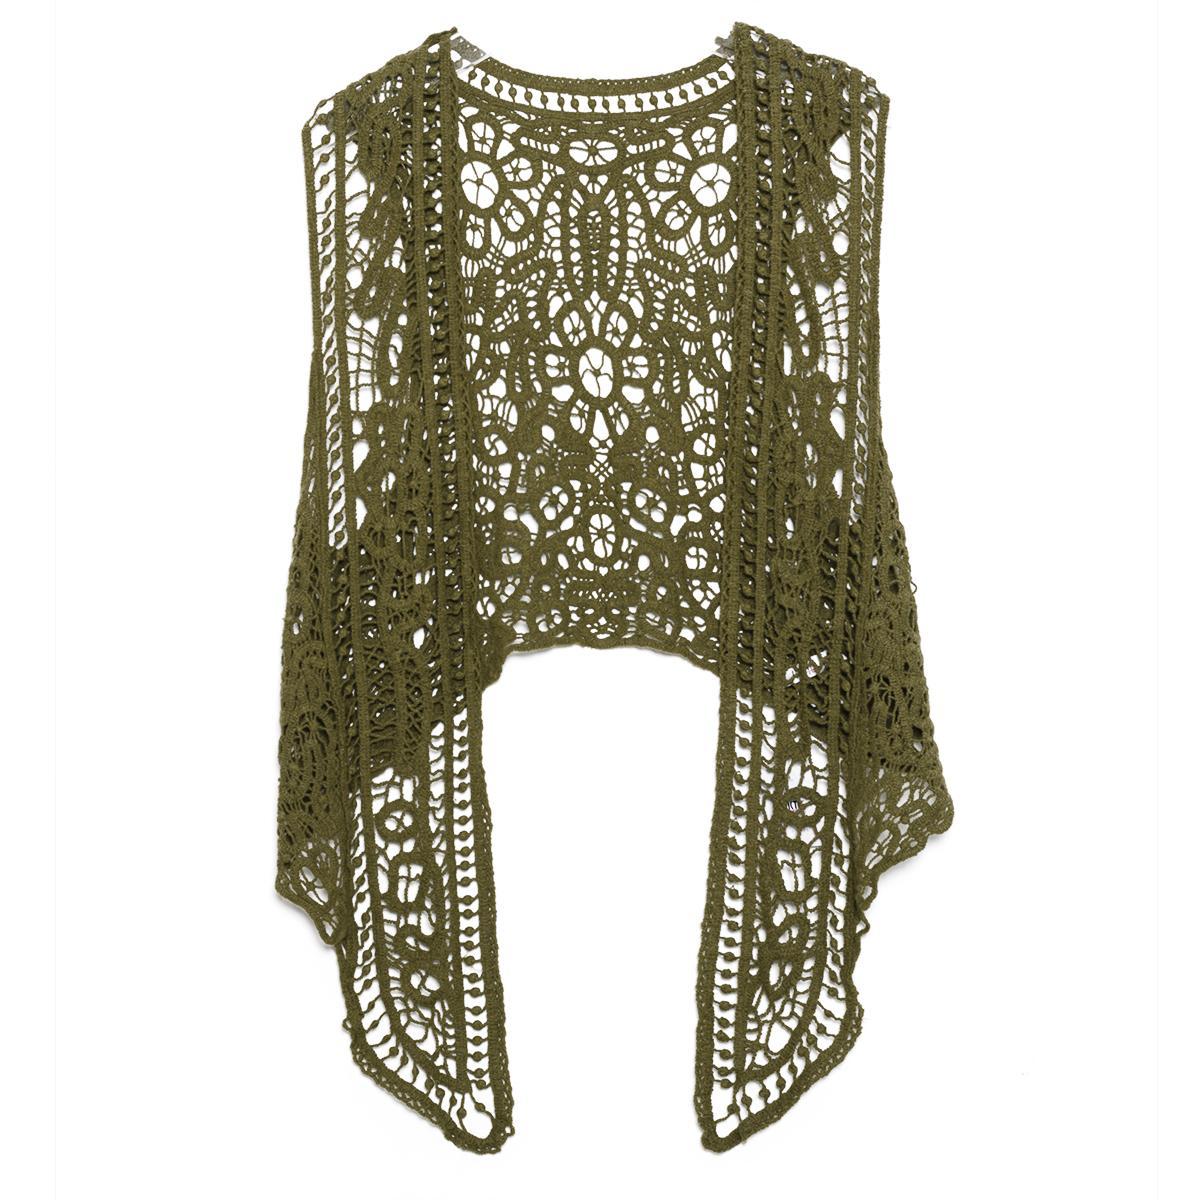 460ebe089 Jastie Asymmetric Open Stitch Cardigan Summer Beach Boho Hippie Personas  Estilo Crochet Tejido Bordado Blusa Sin mangas Chaleco C19041201